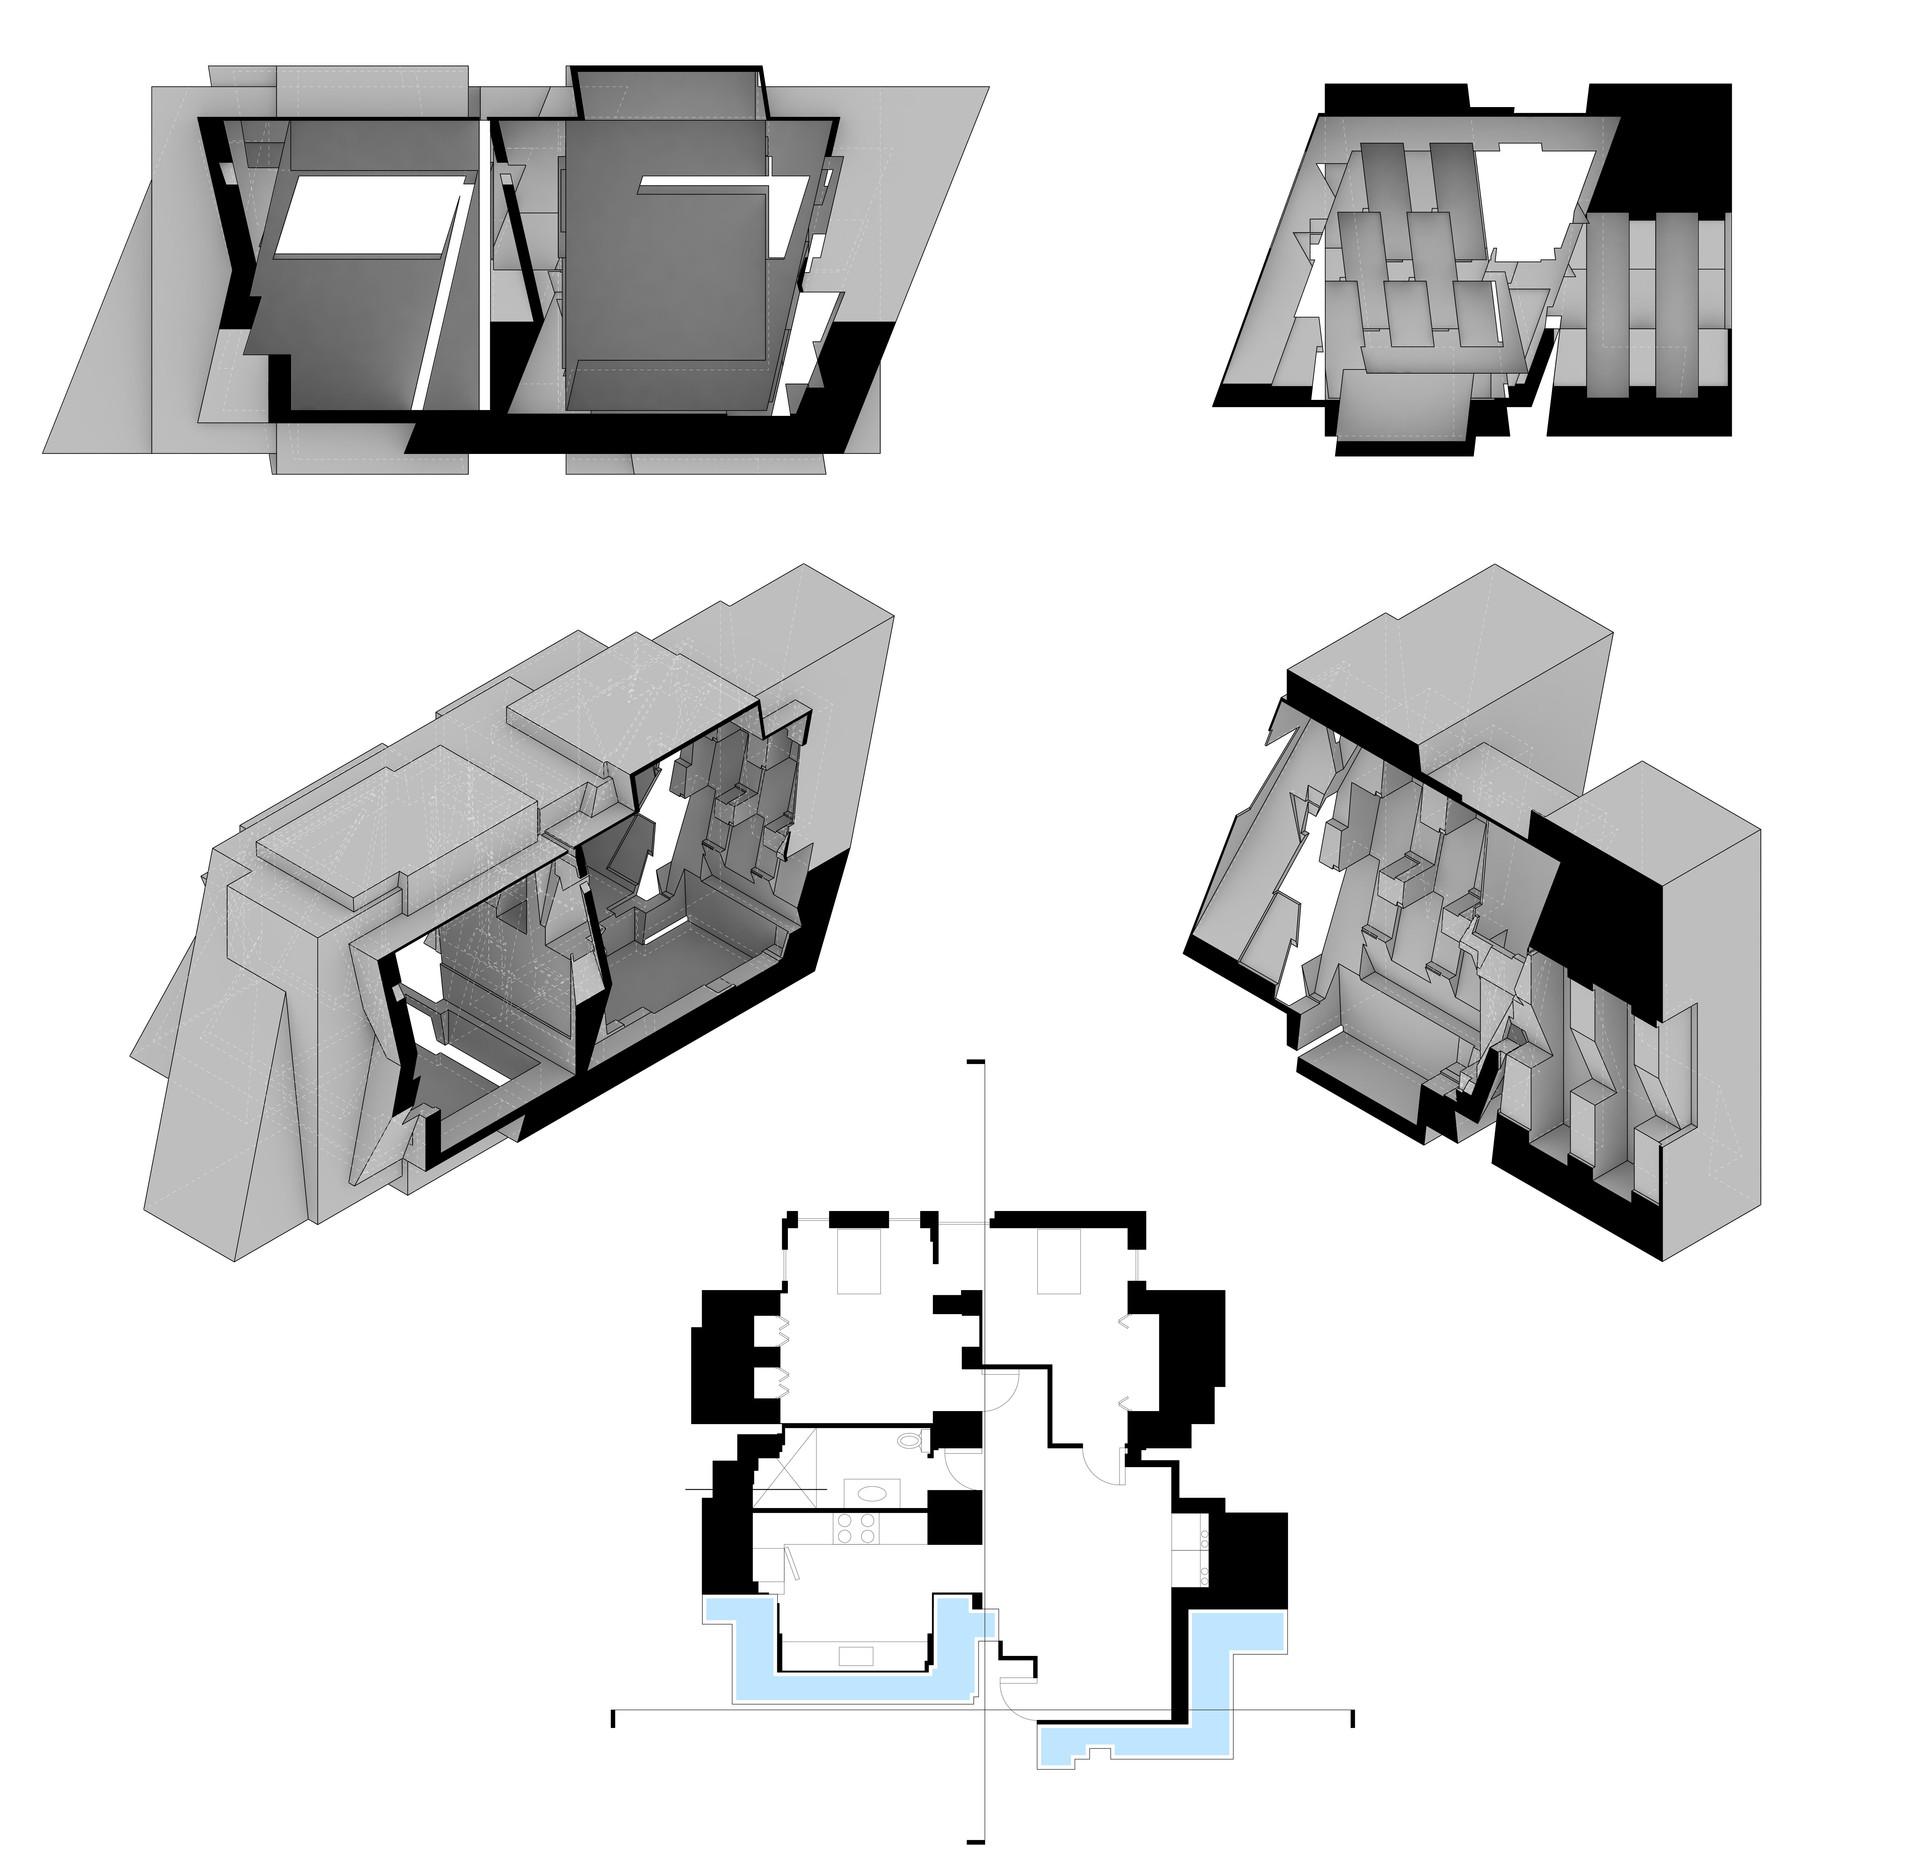 Student Unit Plan